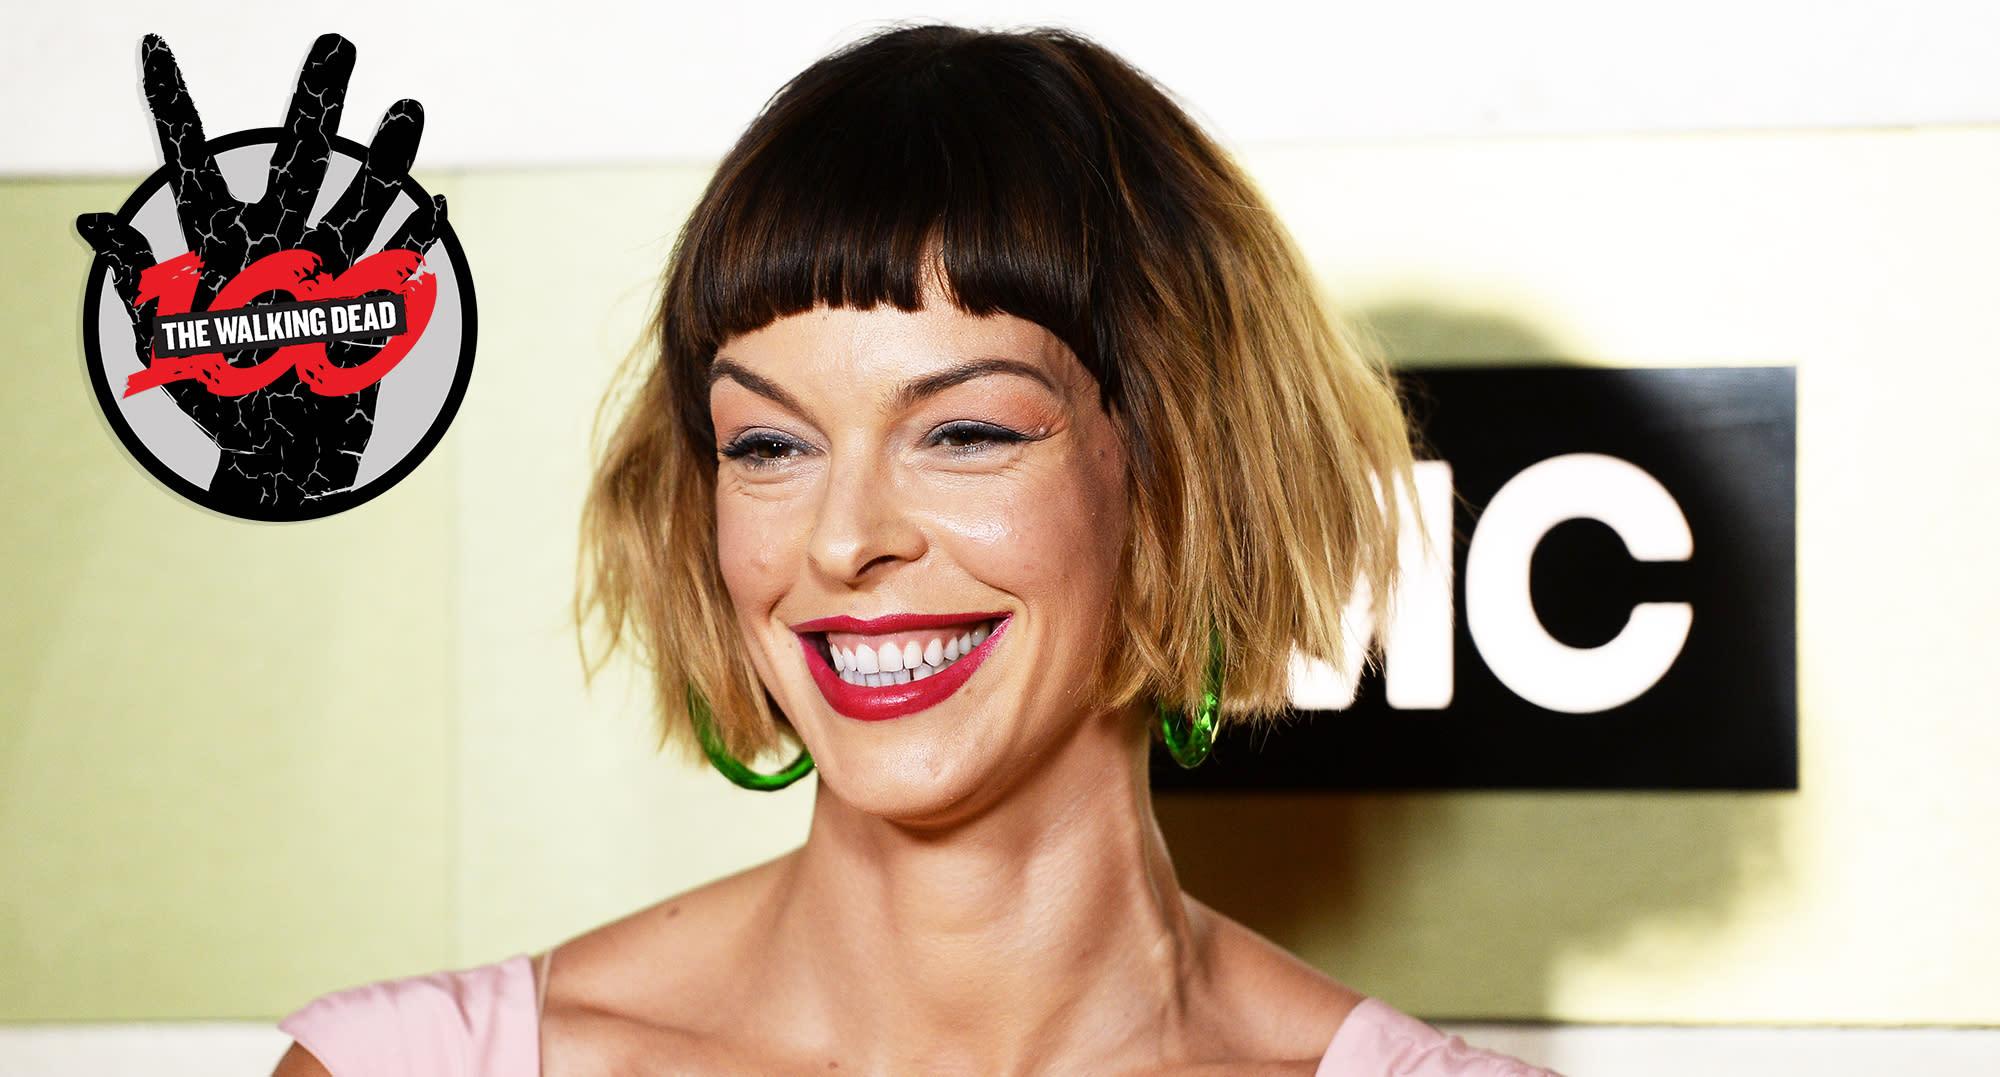 Fun Facts About The Walking Dead Star Pollyanna Mcintosh